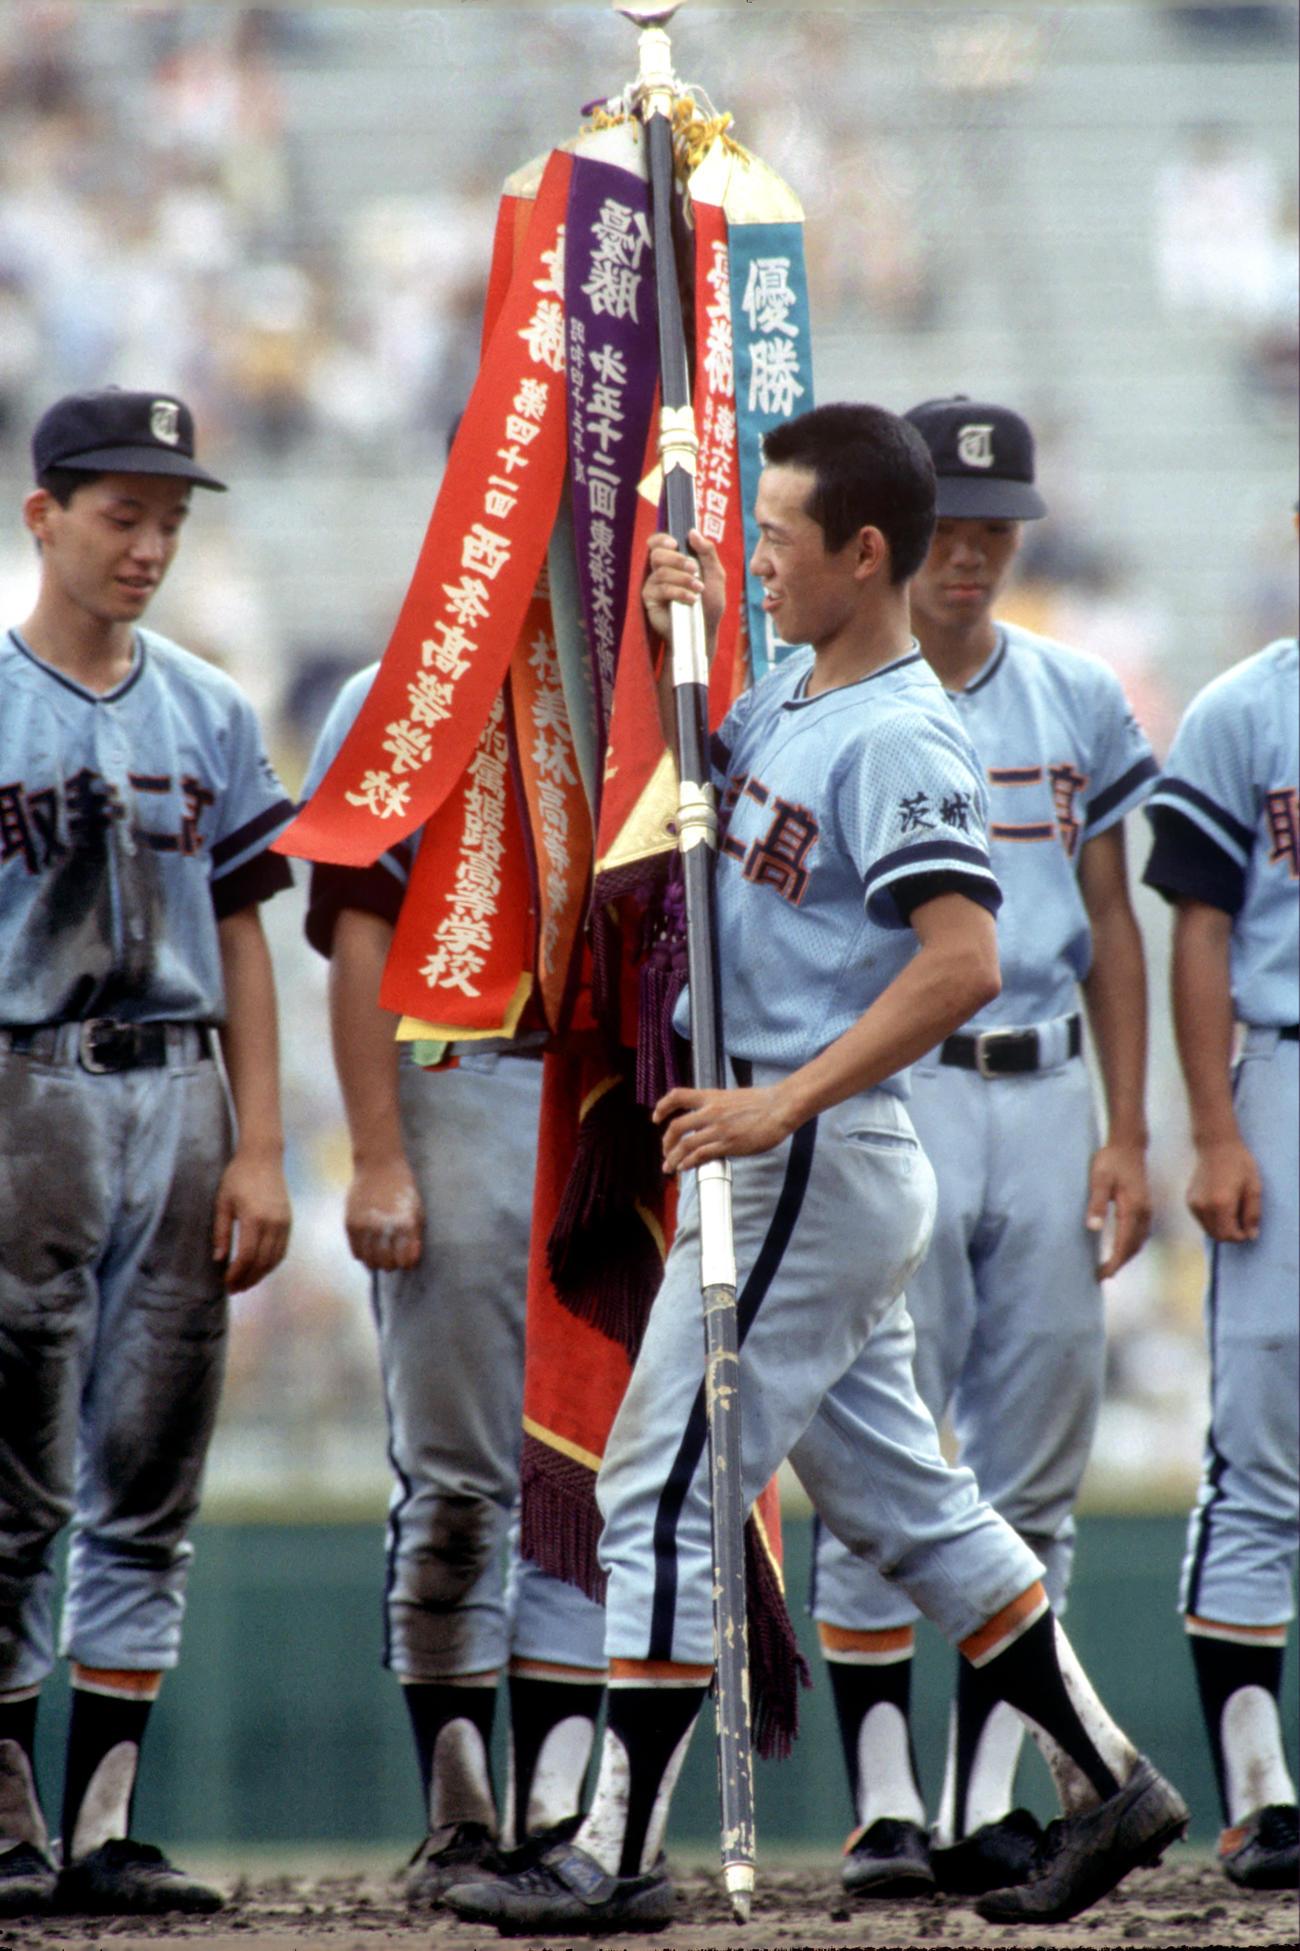 84年8月、第66回全国高校野球選手権 決勝戦 PL学園対取手二 優勝旗を受け取り列に戻る取手二・吉田剛主将